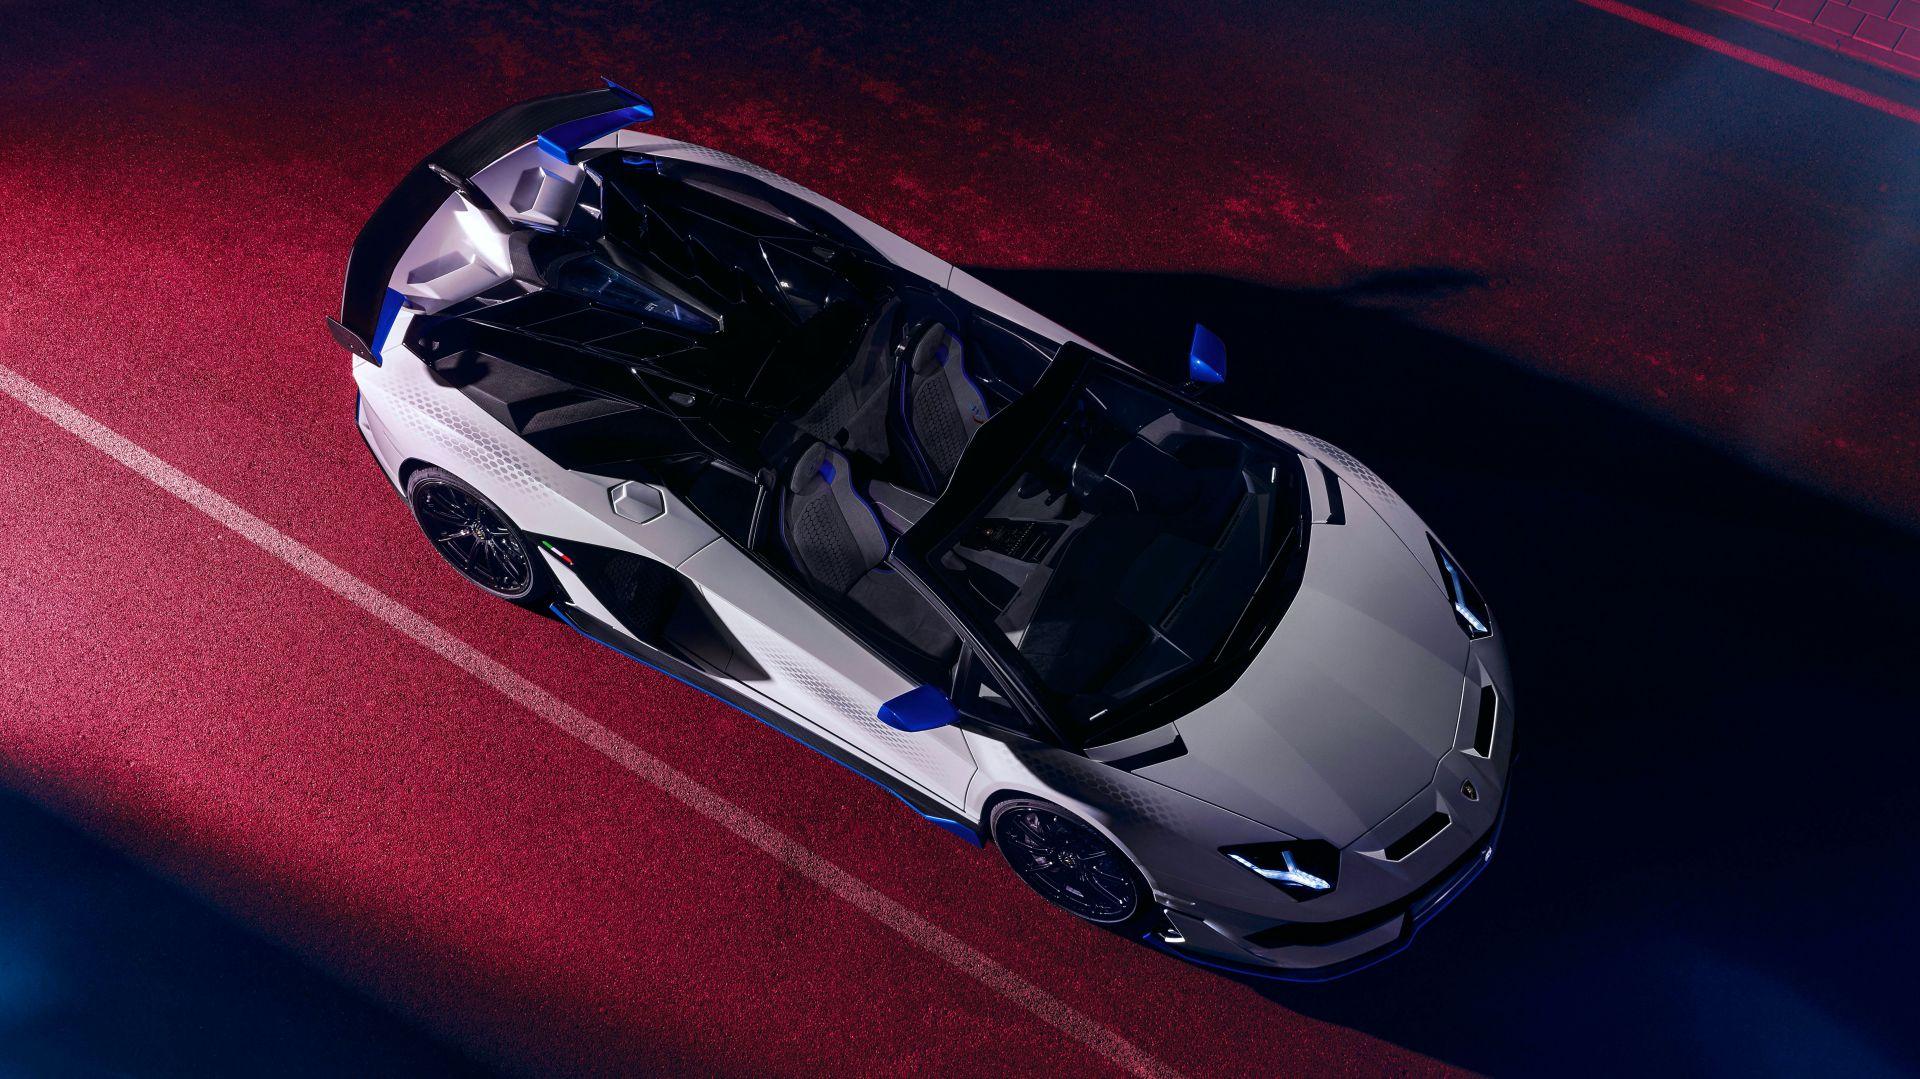 Lamborghini-Aventador-SVJ-Xago-Edition-8